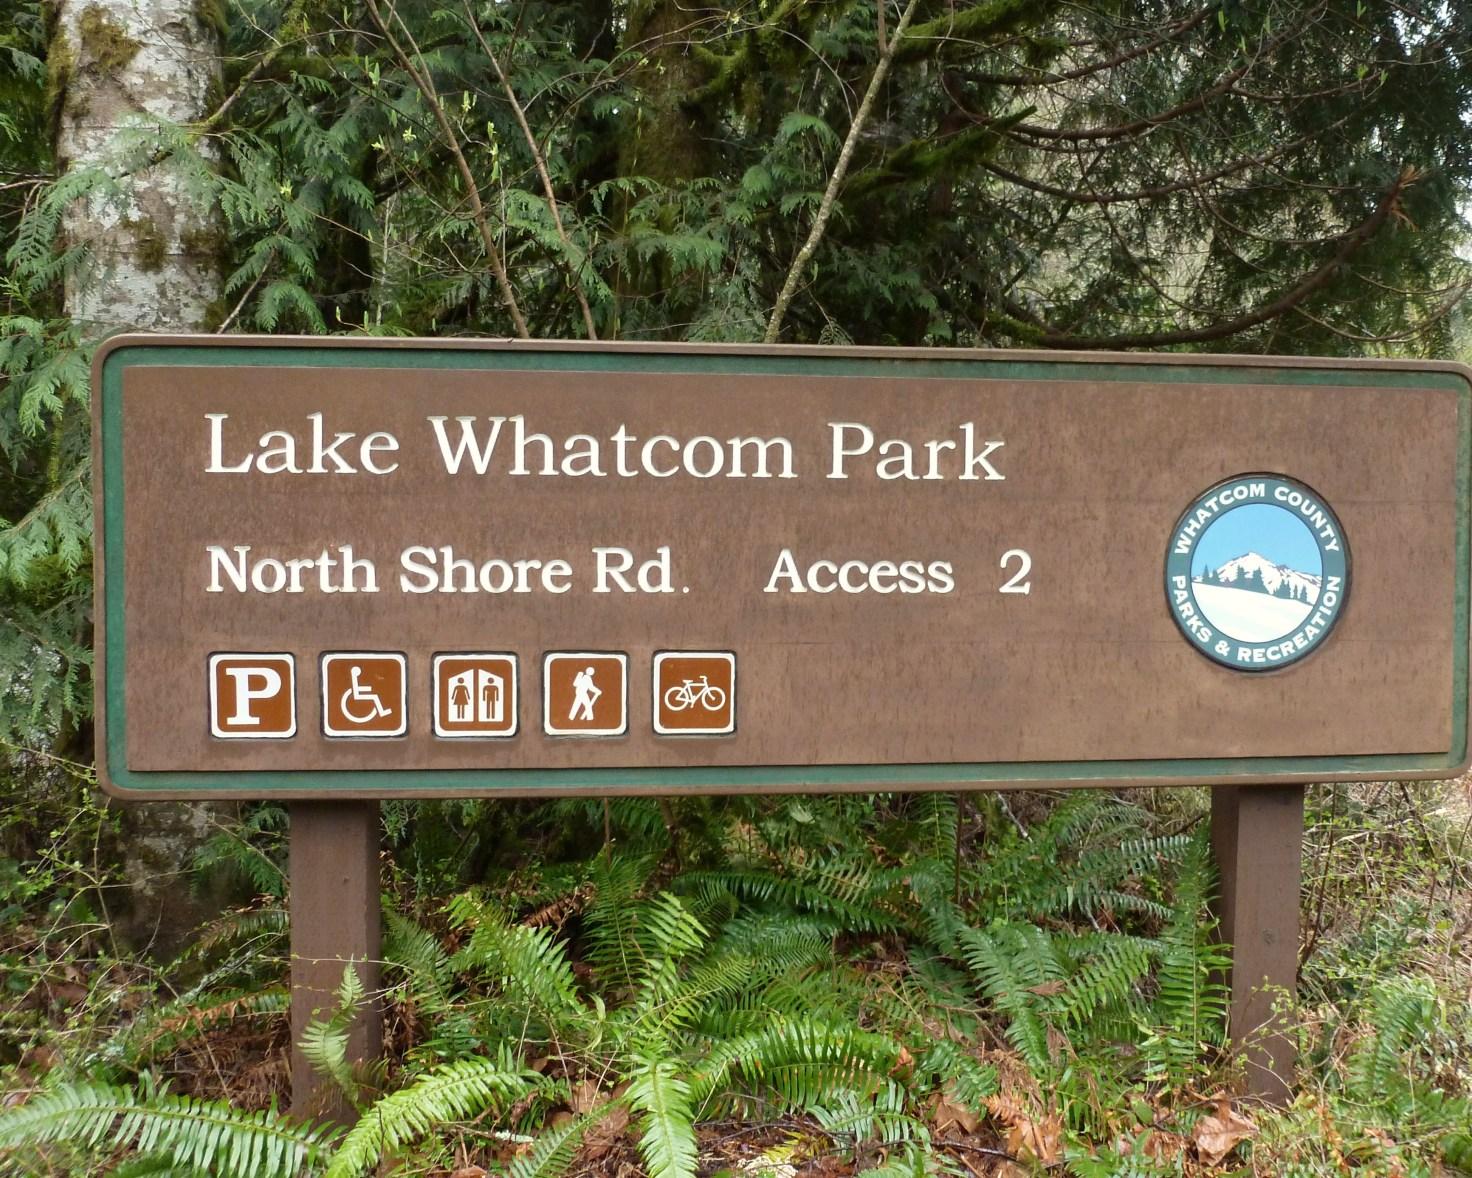 lake whatcom park sign.jpg